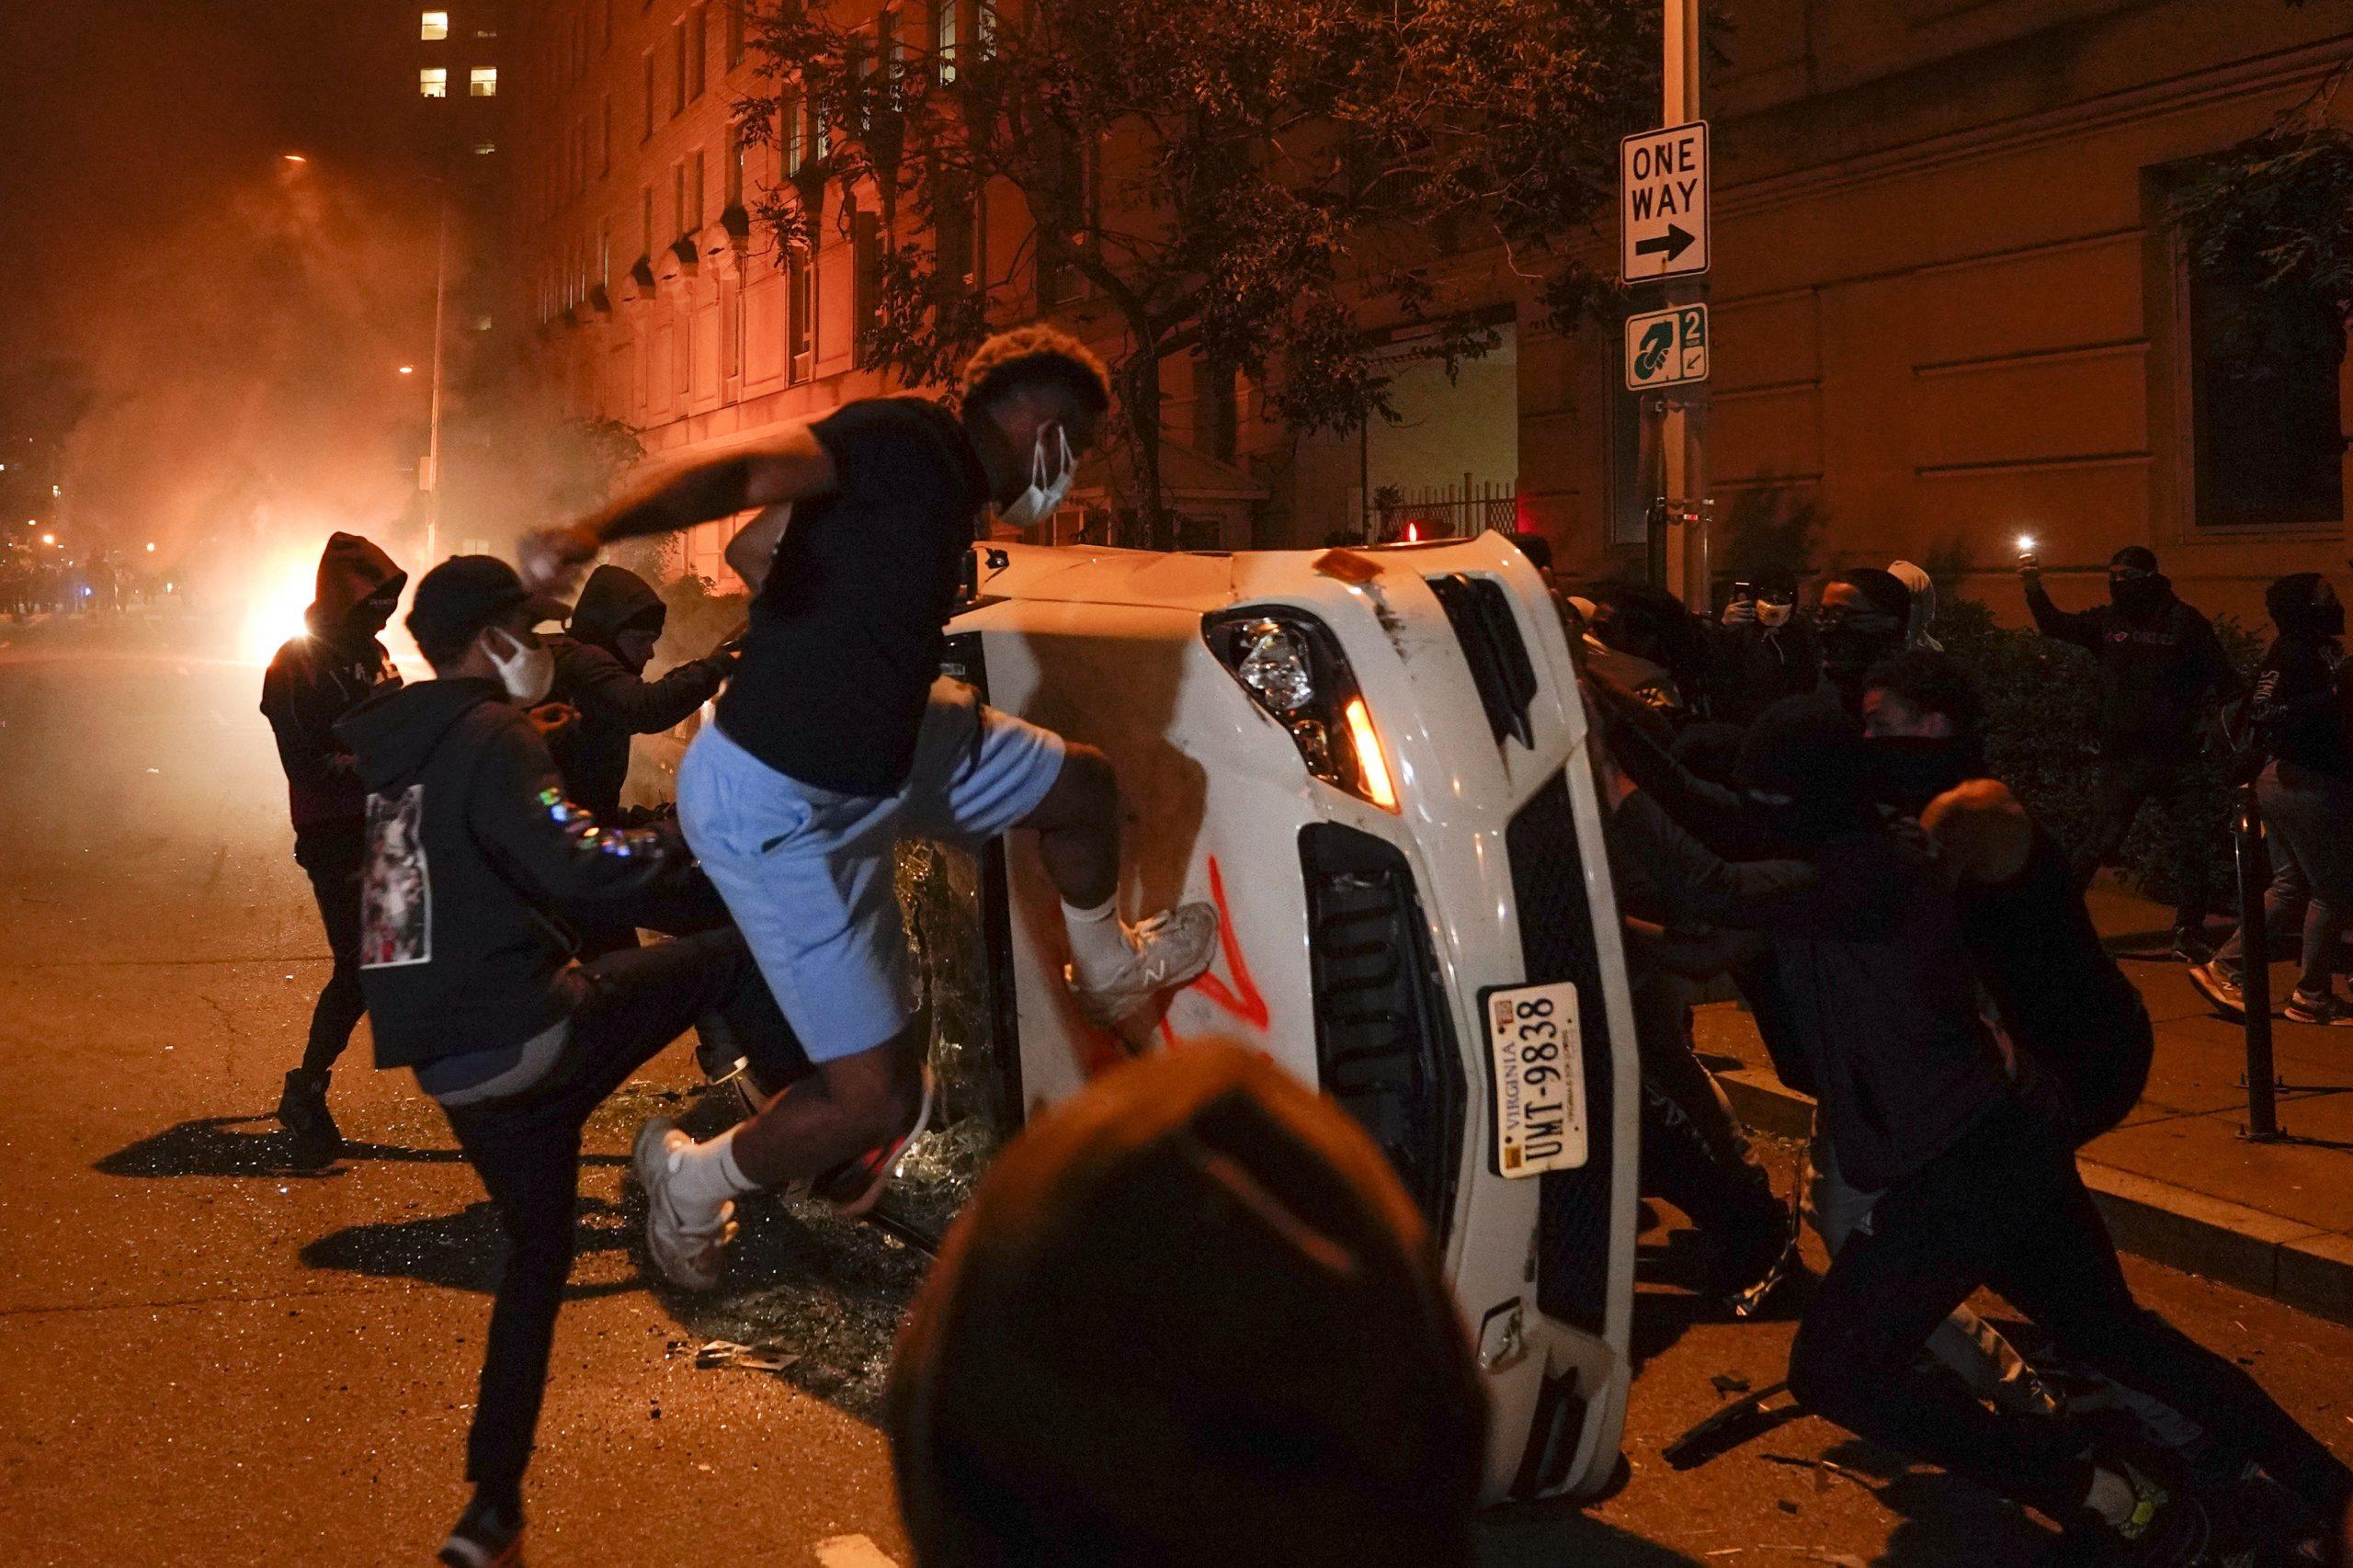 Weekend of Violent Protests Sweeps United States